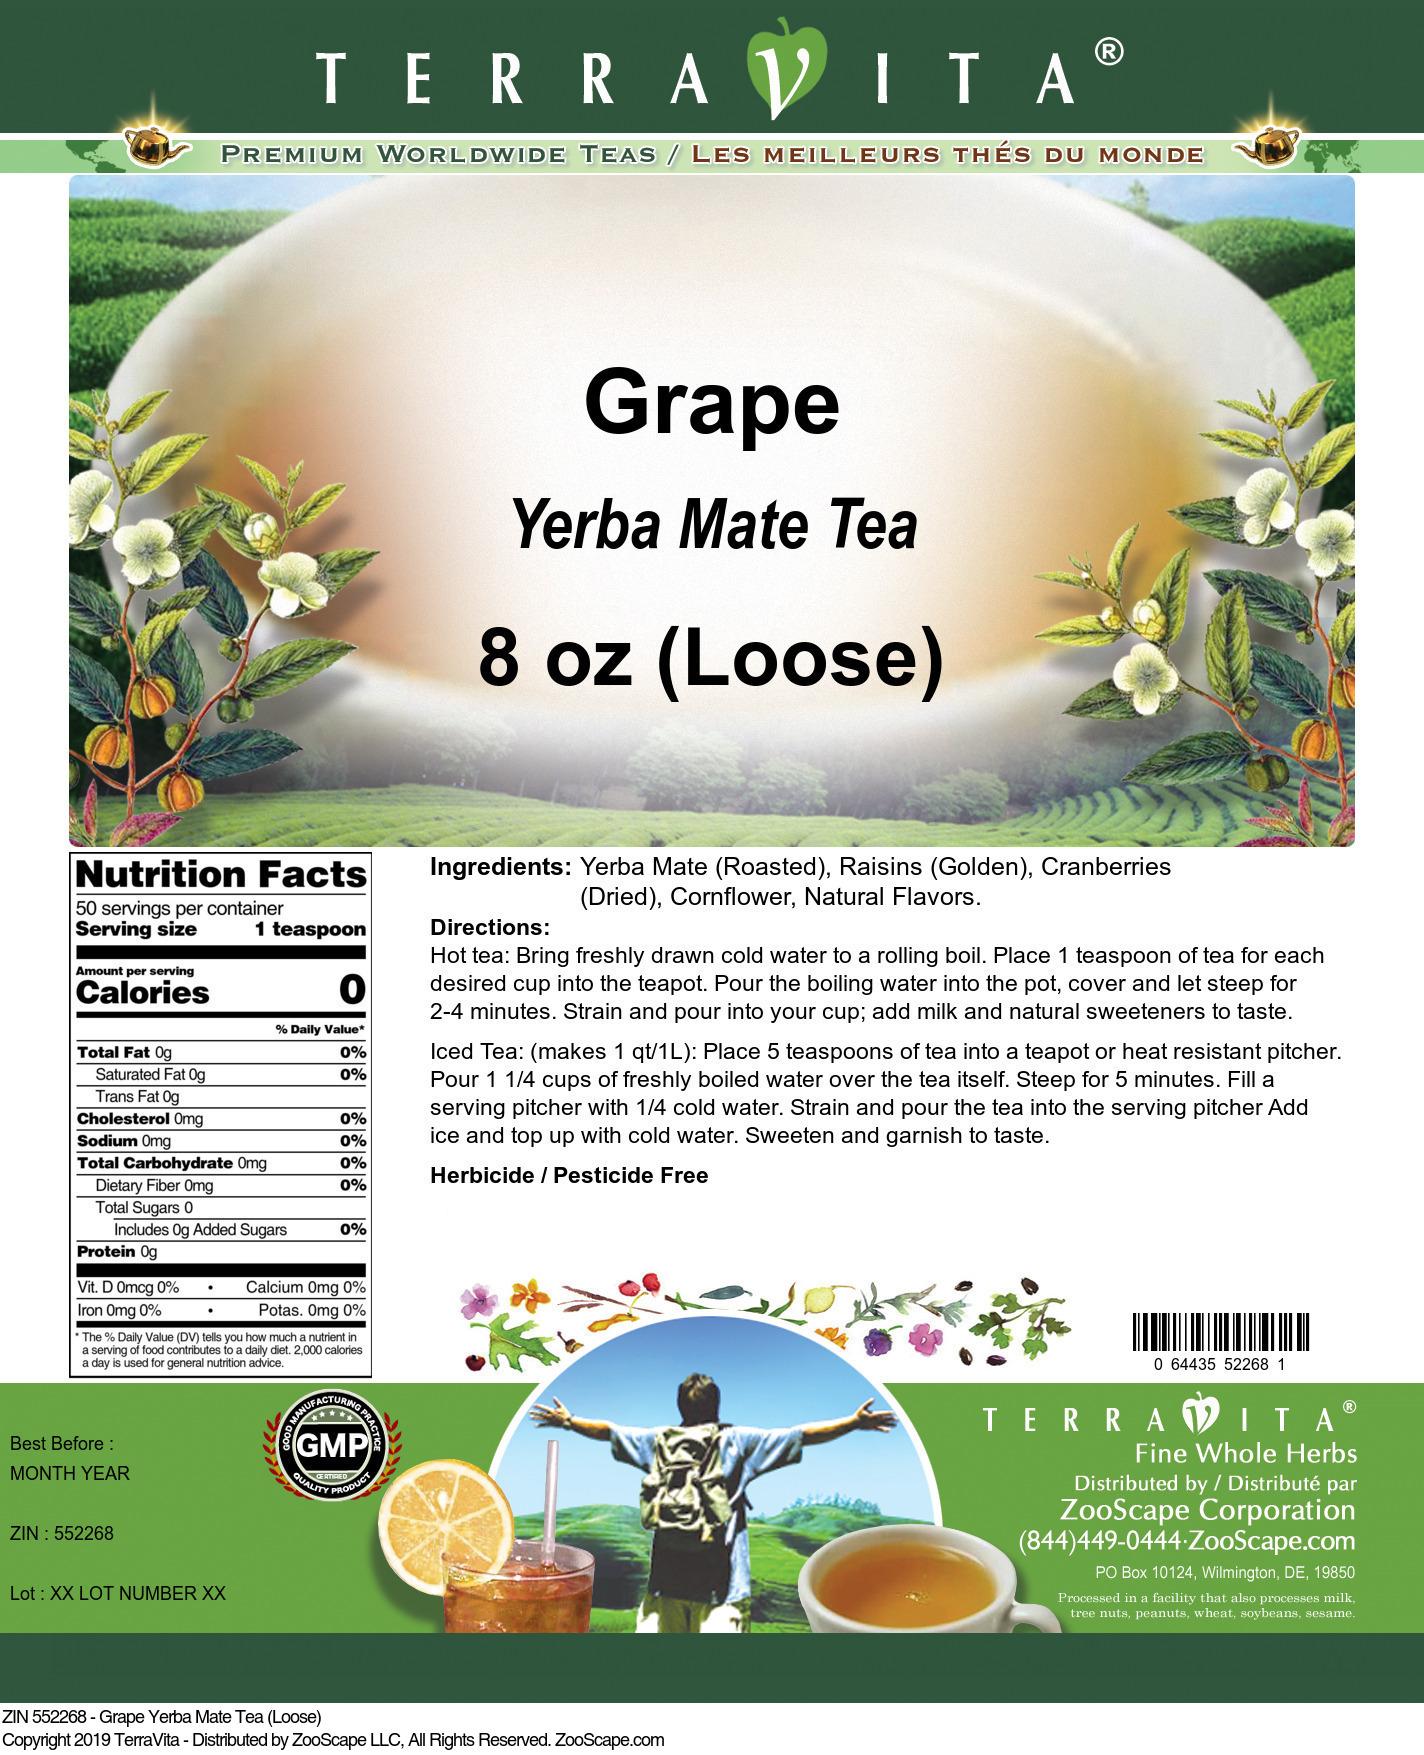 Grape Yerba Mate Tea (Loose)